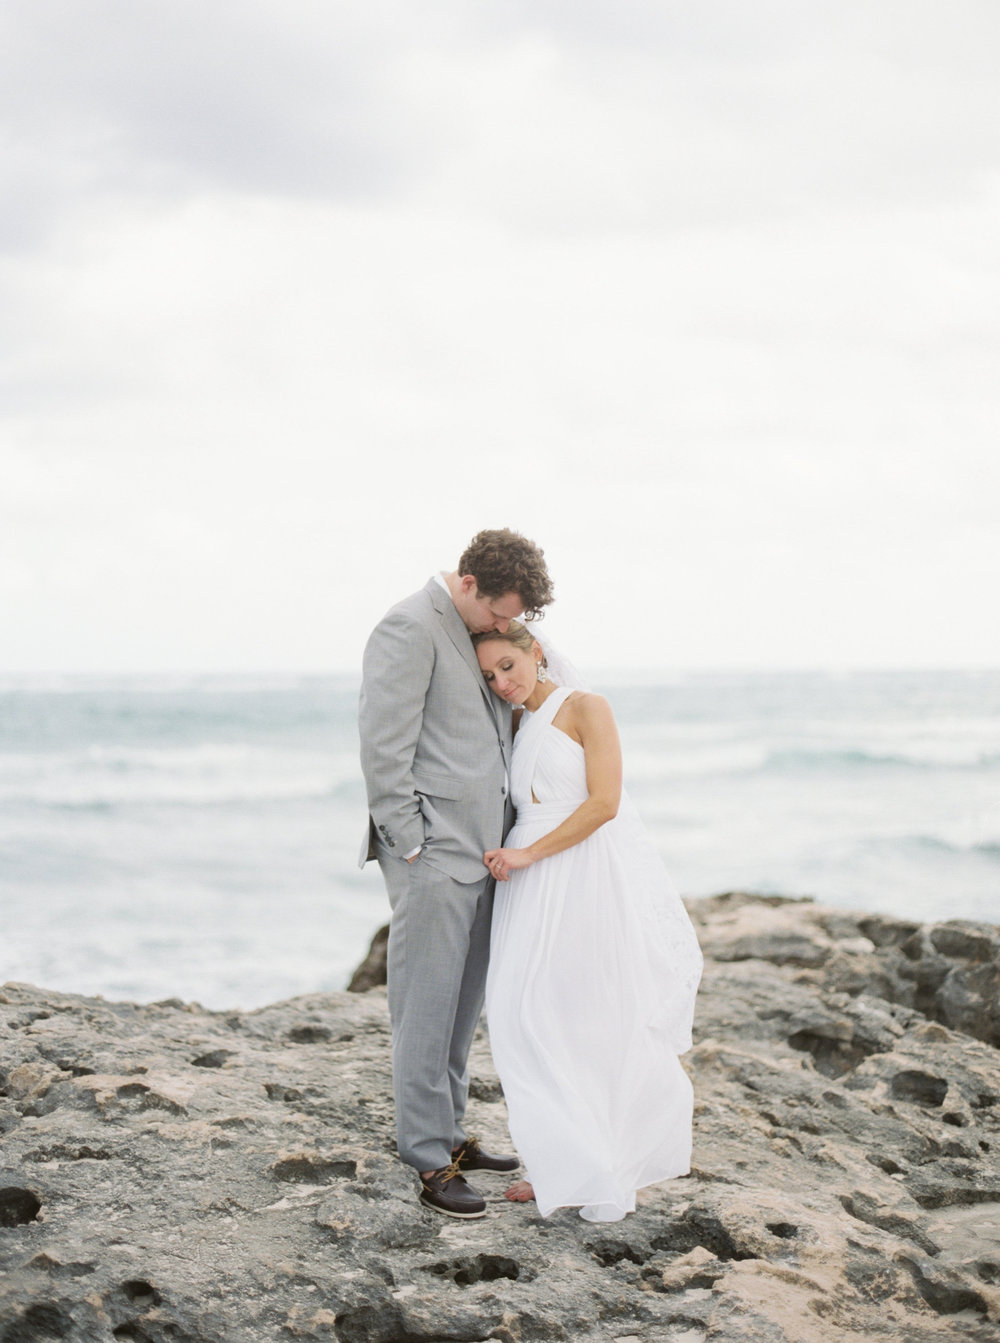 Kyle John l Fine Art Wedding Photography l Chicago, Copenhagen, California, New York, Destination l Blog l Lauren & Greg_26